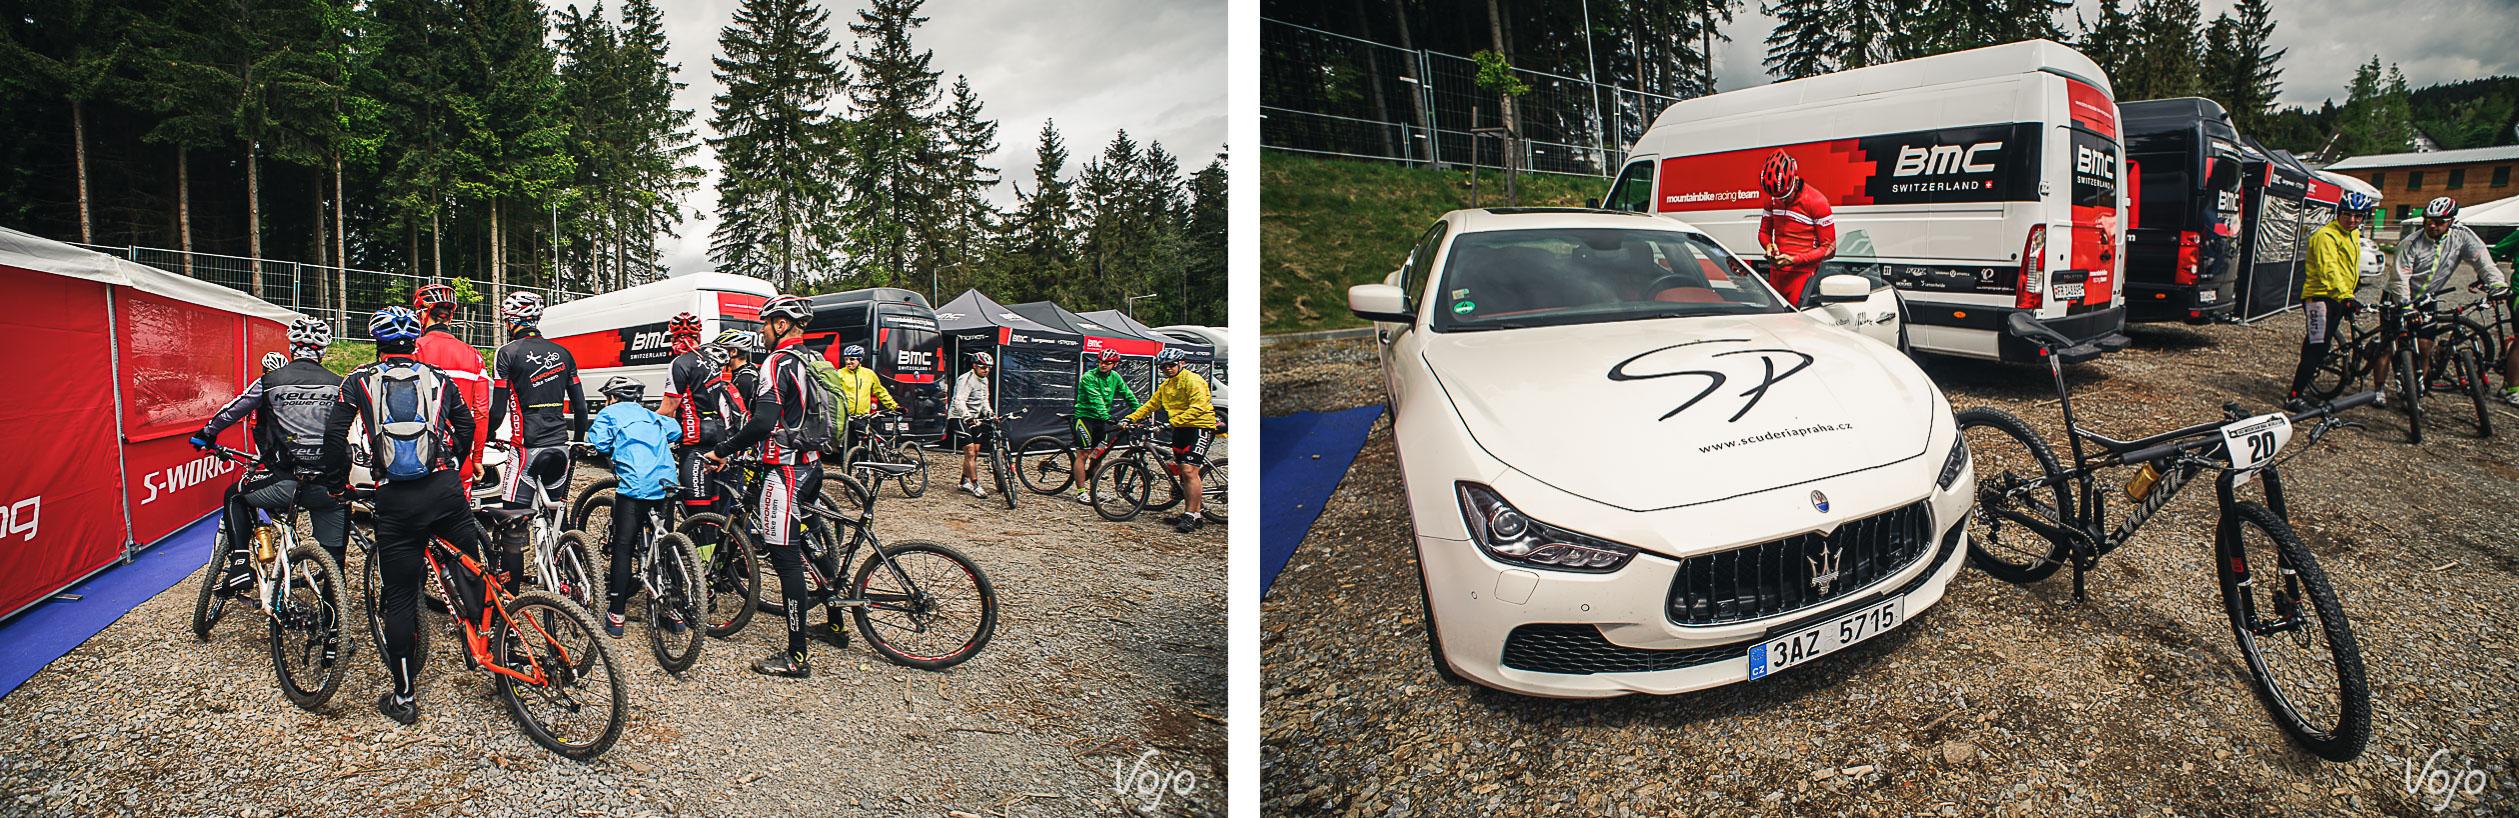 1-World_Cup_MTB_Pro_Bike_Check_Specialized_Epic_Jaroslav_Kulhavy_Copyright_OBeart_VojoMag-1